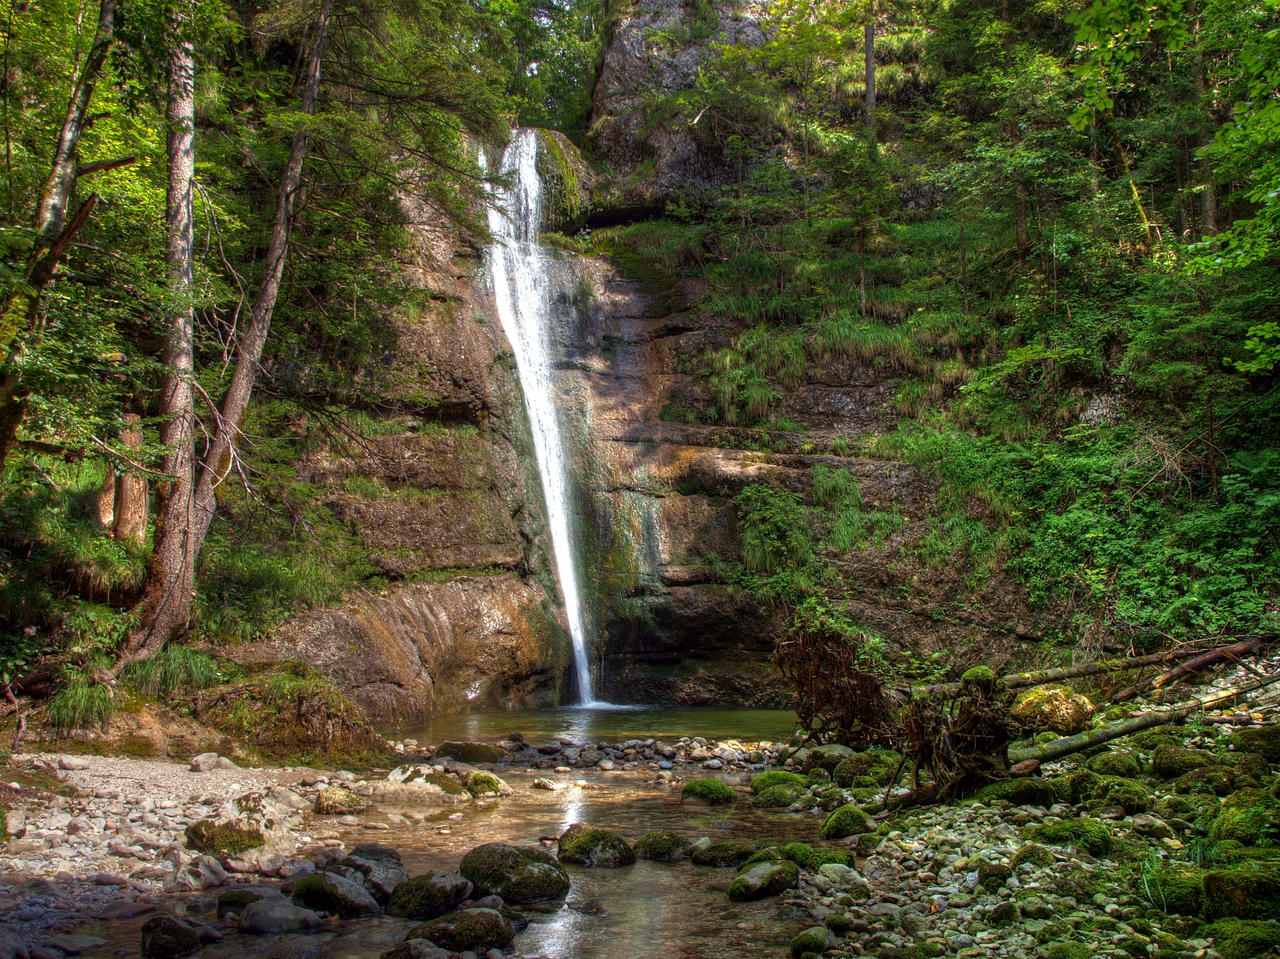 Waterfall Background by Burtn